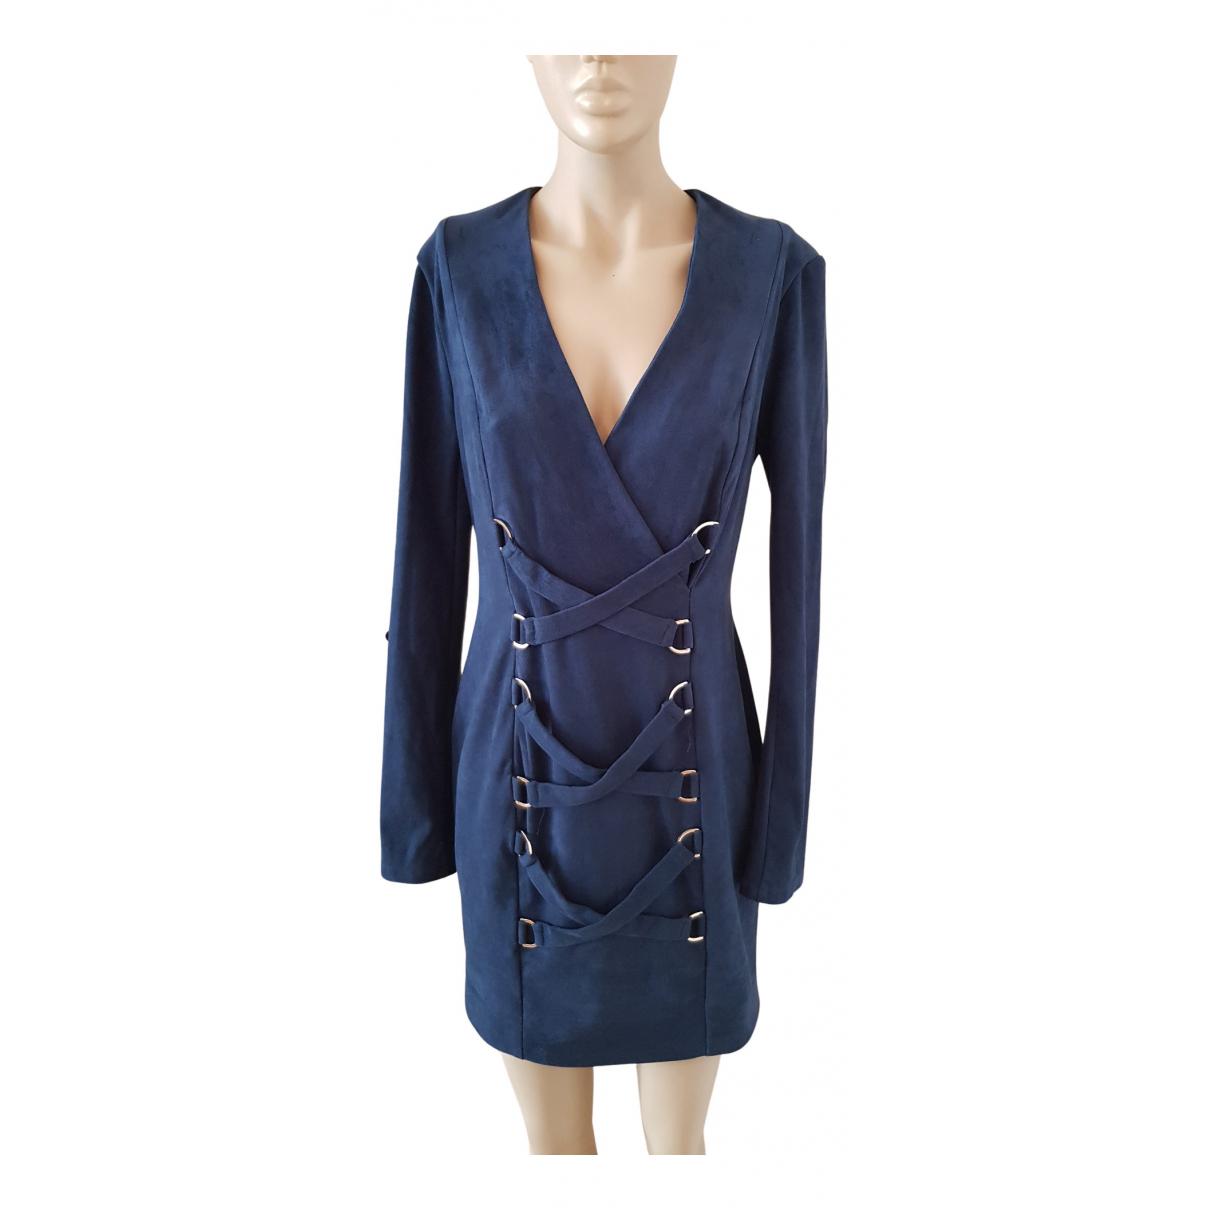 Misha Collection \N Kleid in  Blau Polyester